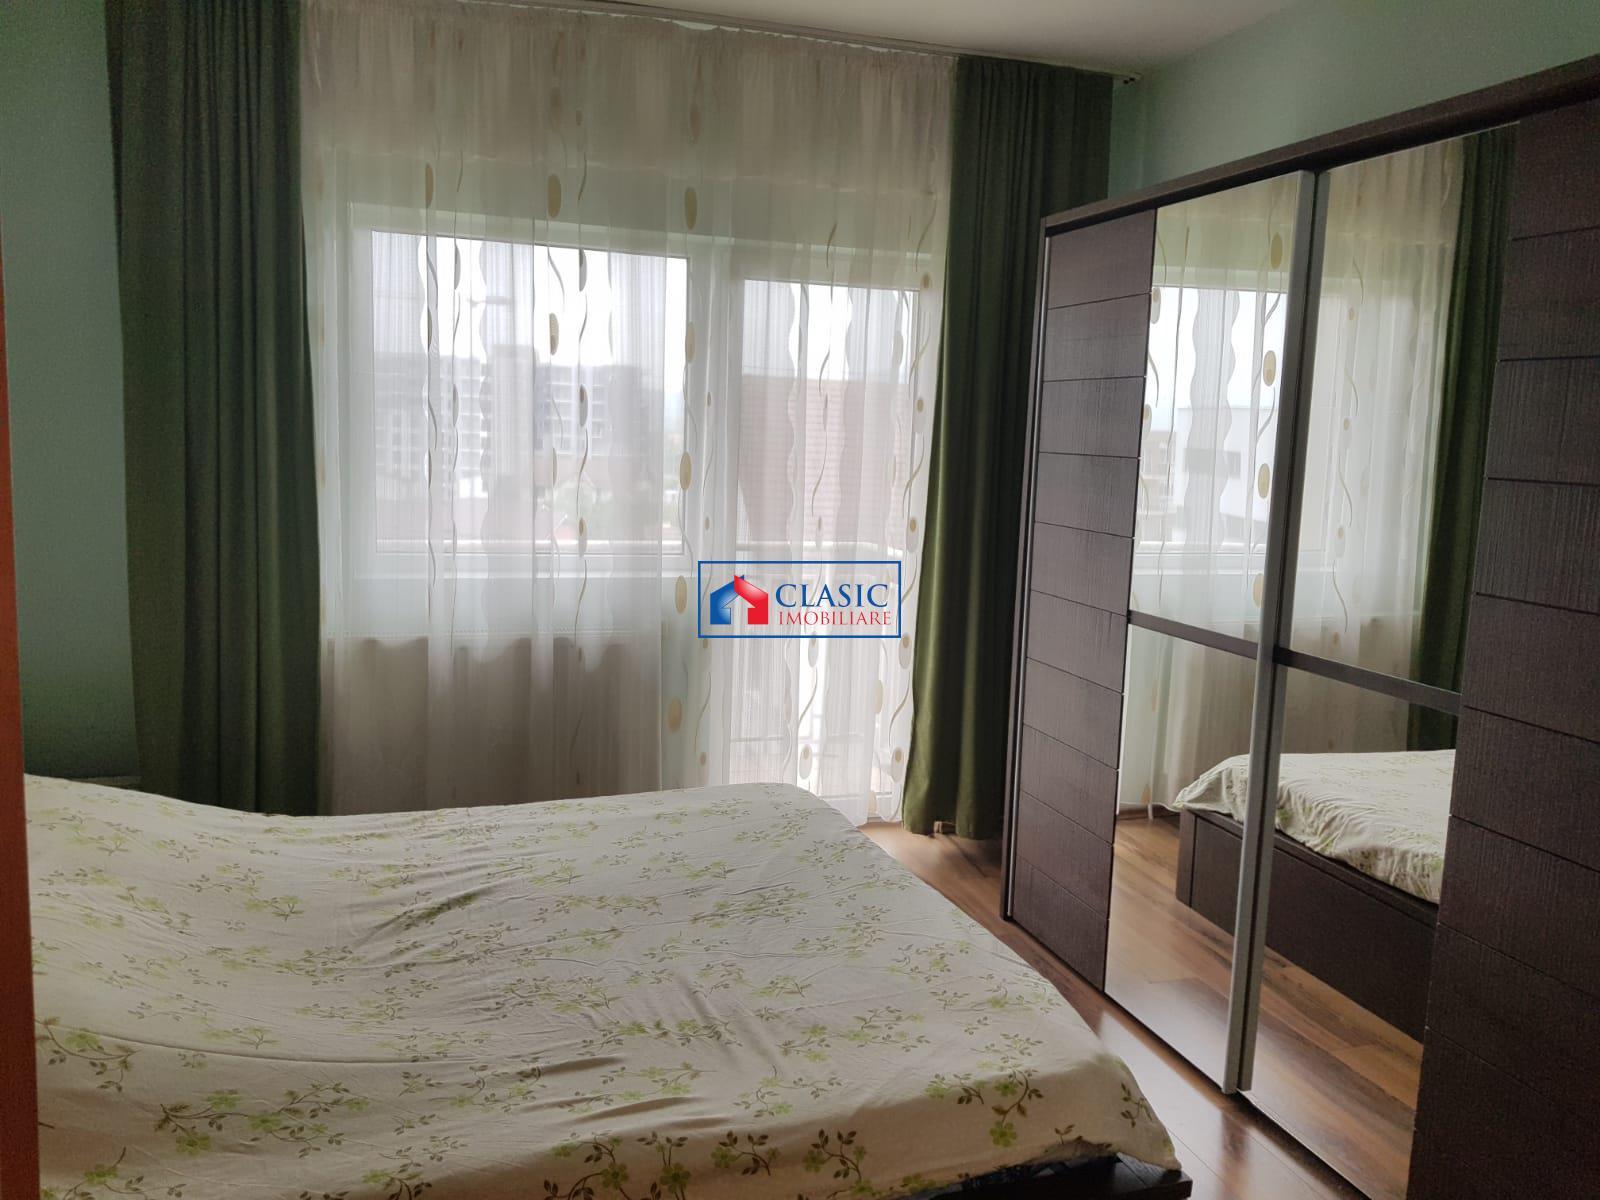 Vanzare Apartament 4 camere Buna Ziua   C.Turzii, Cluj Napoca